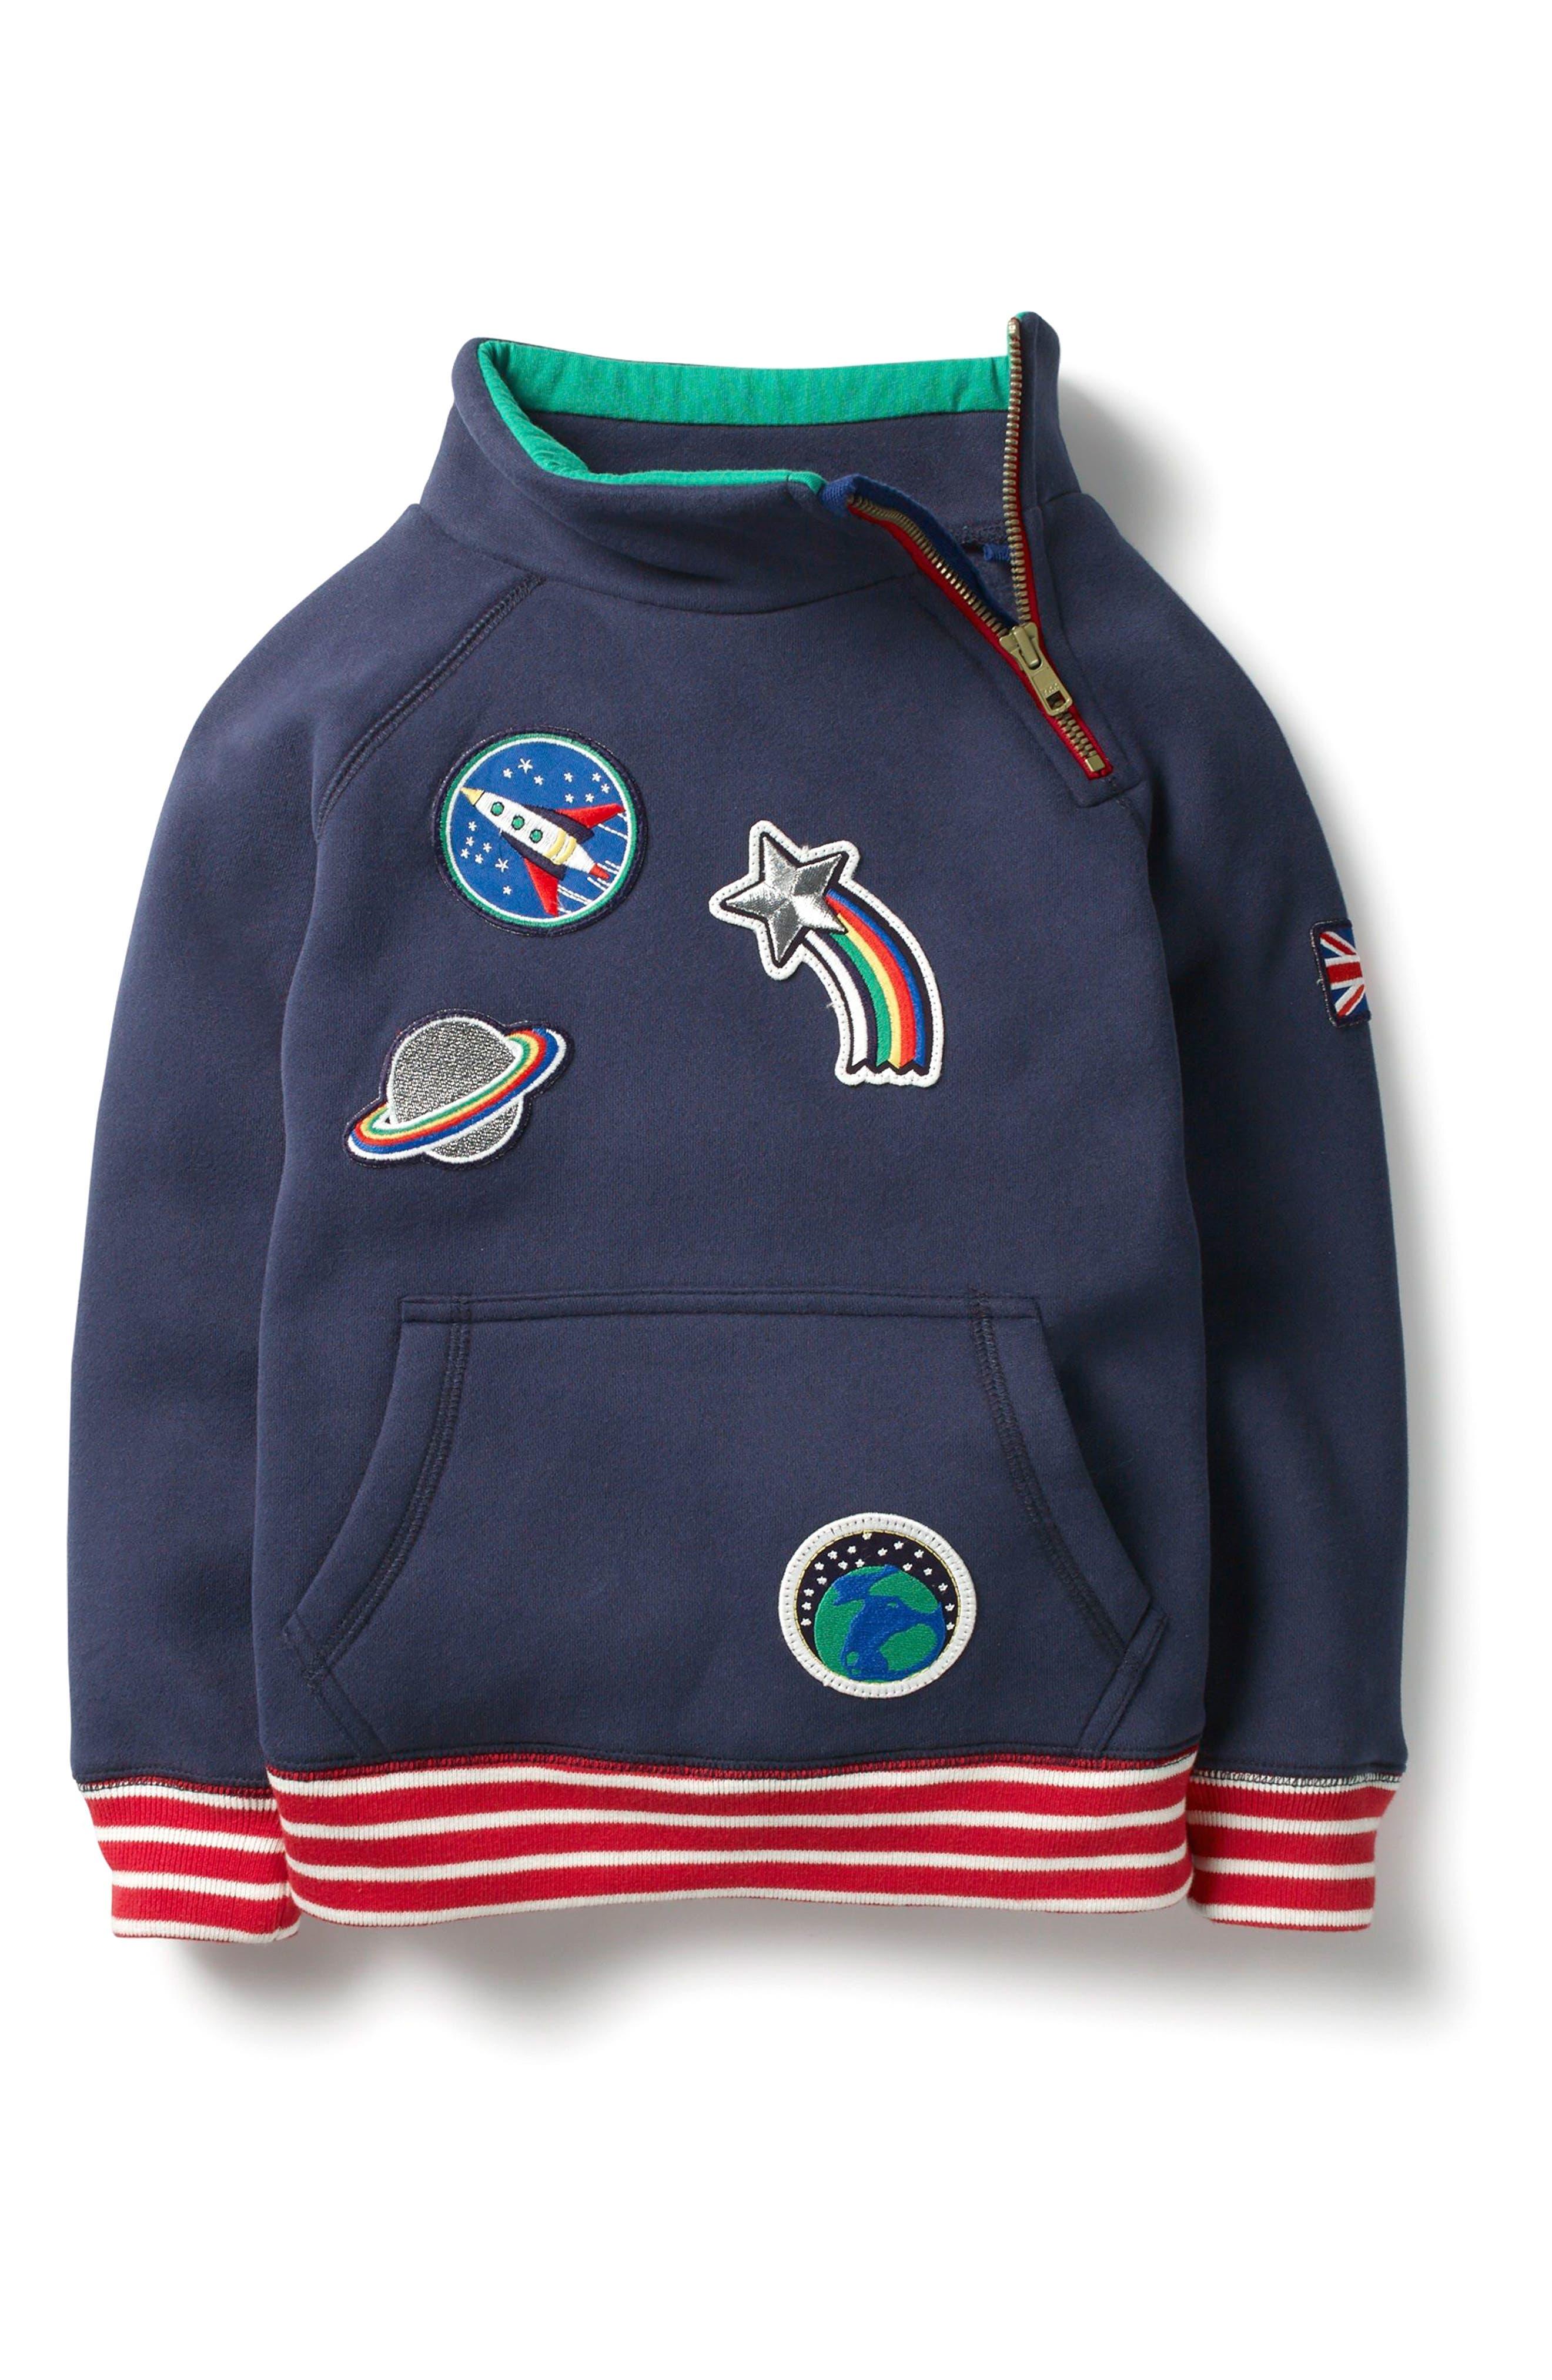 Main Image - Mini Boden Outer Space Zip Sweatshirt (Toddler Boys, Little Boys & Big Boys)